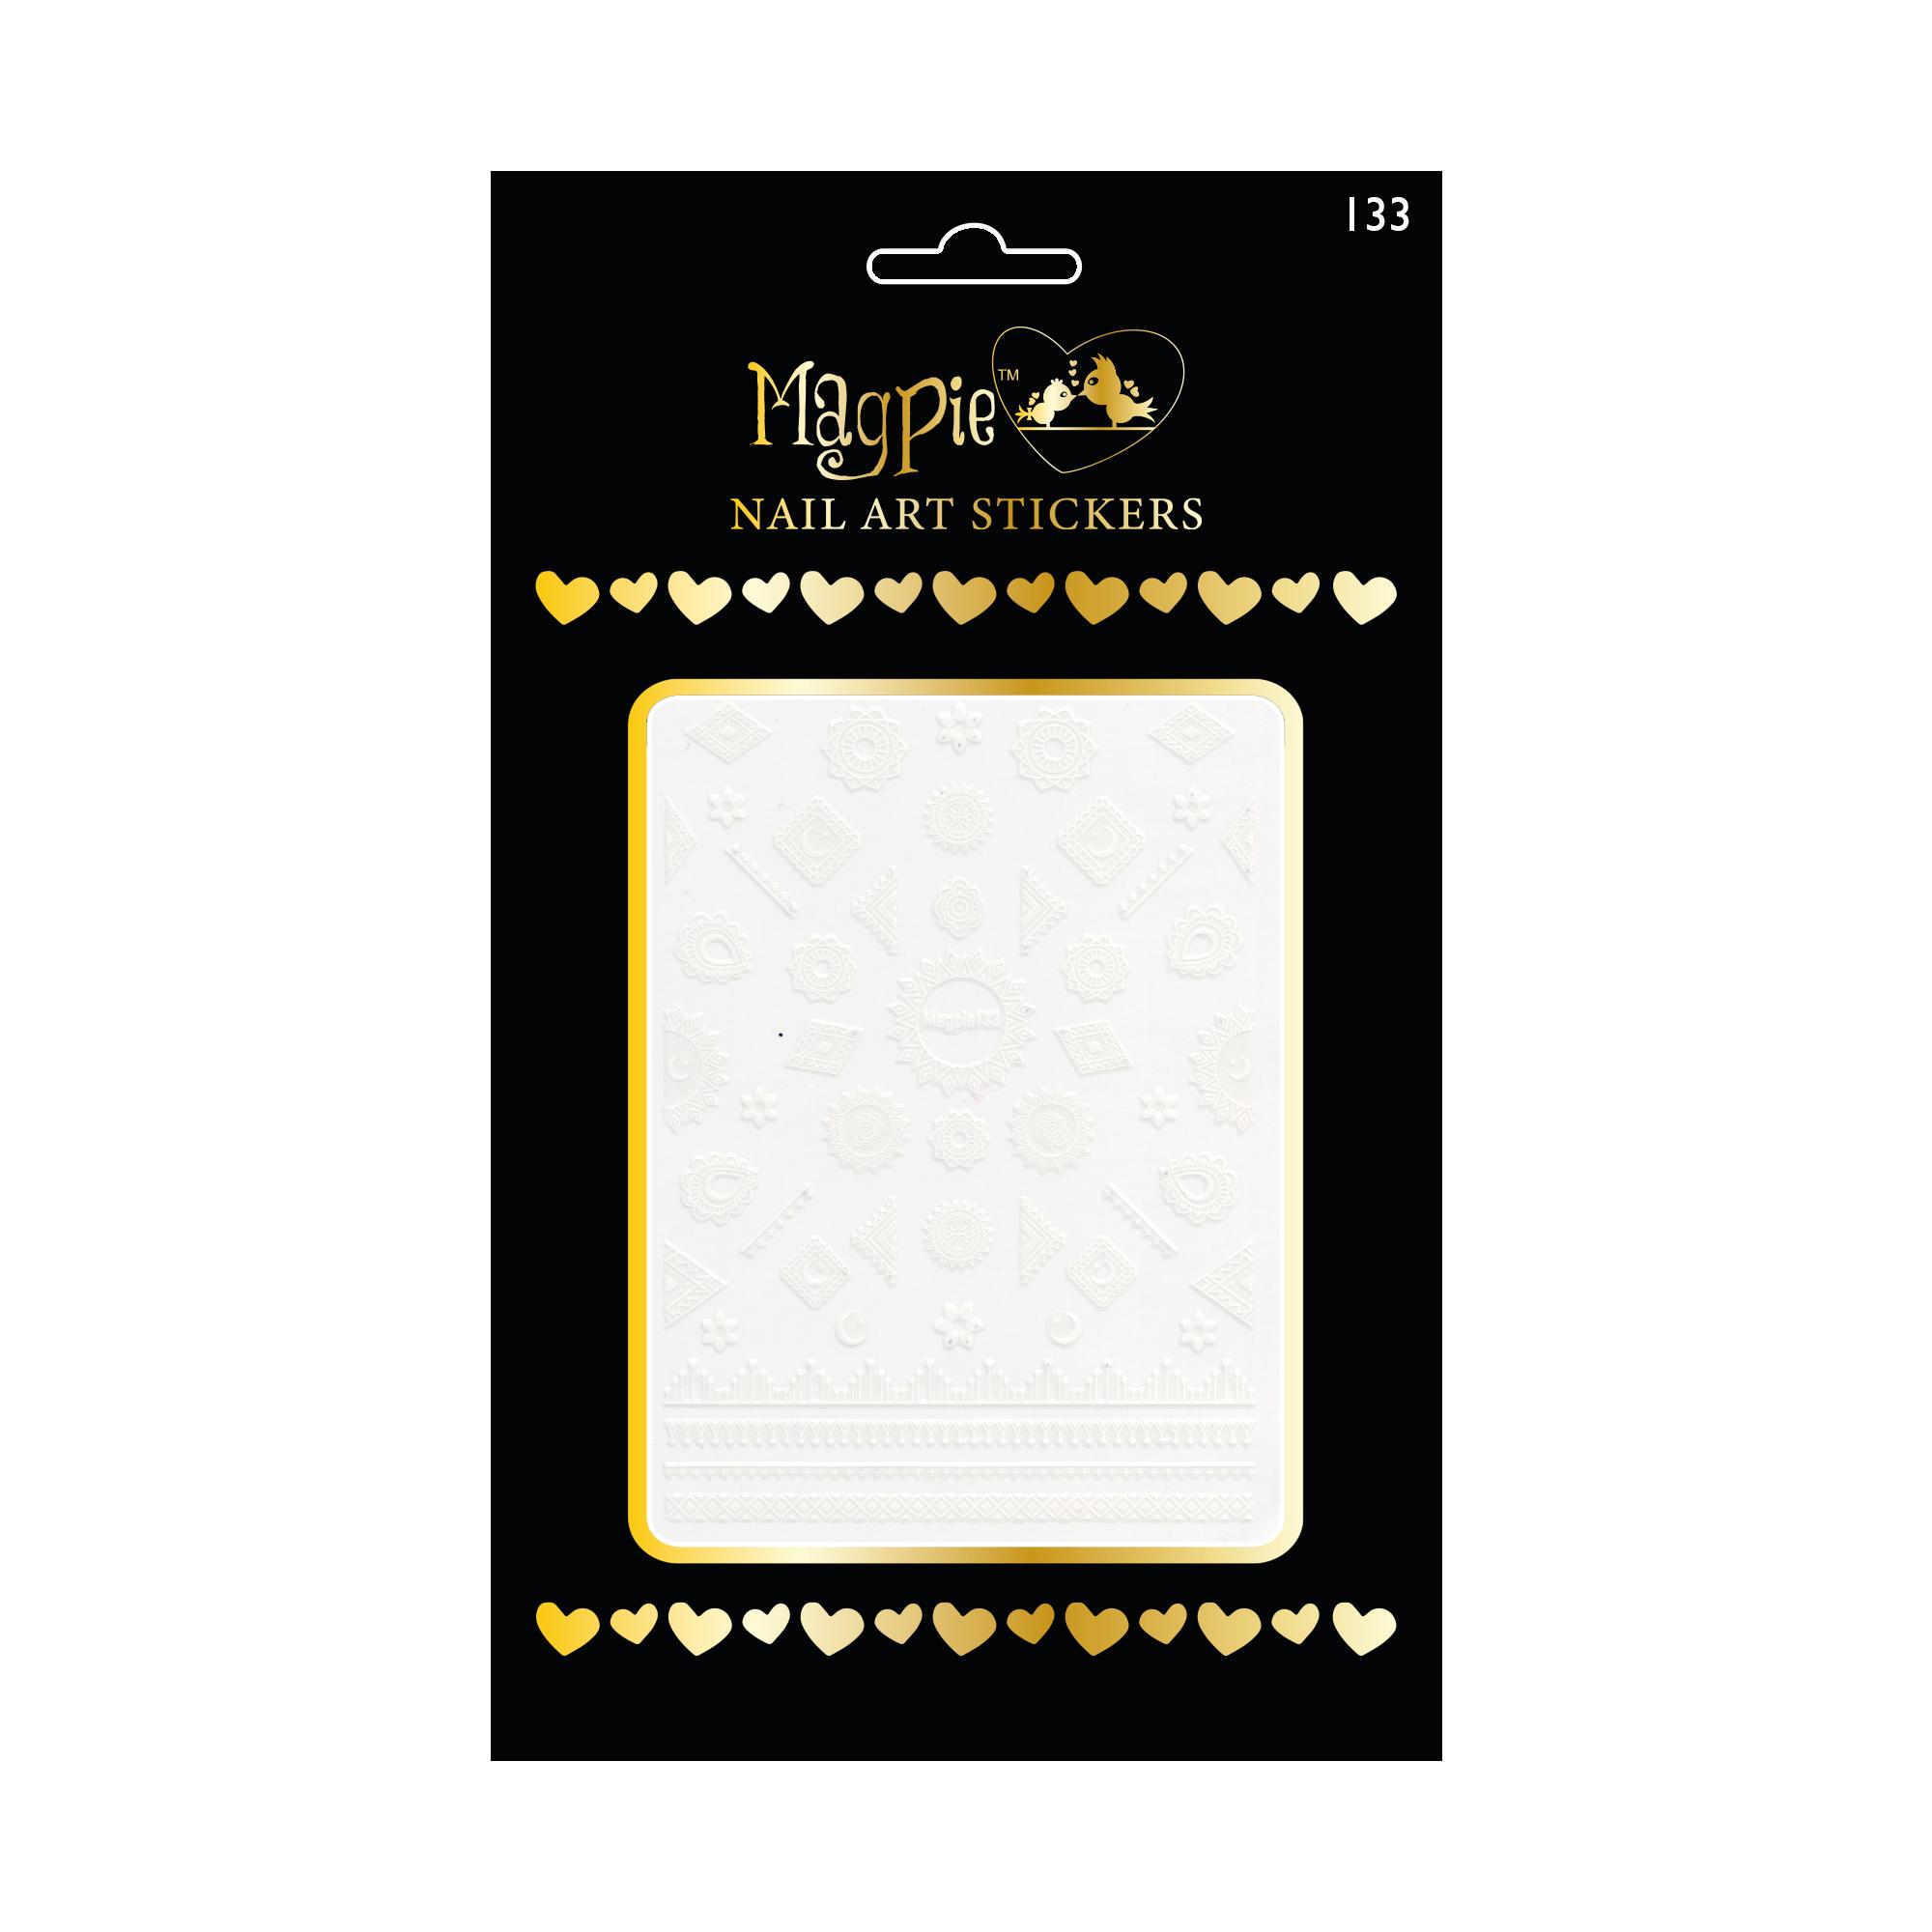 Magpie 133 white stickers